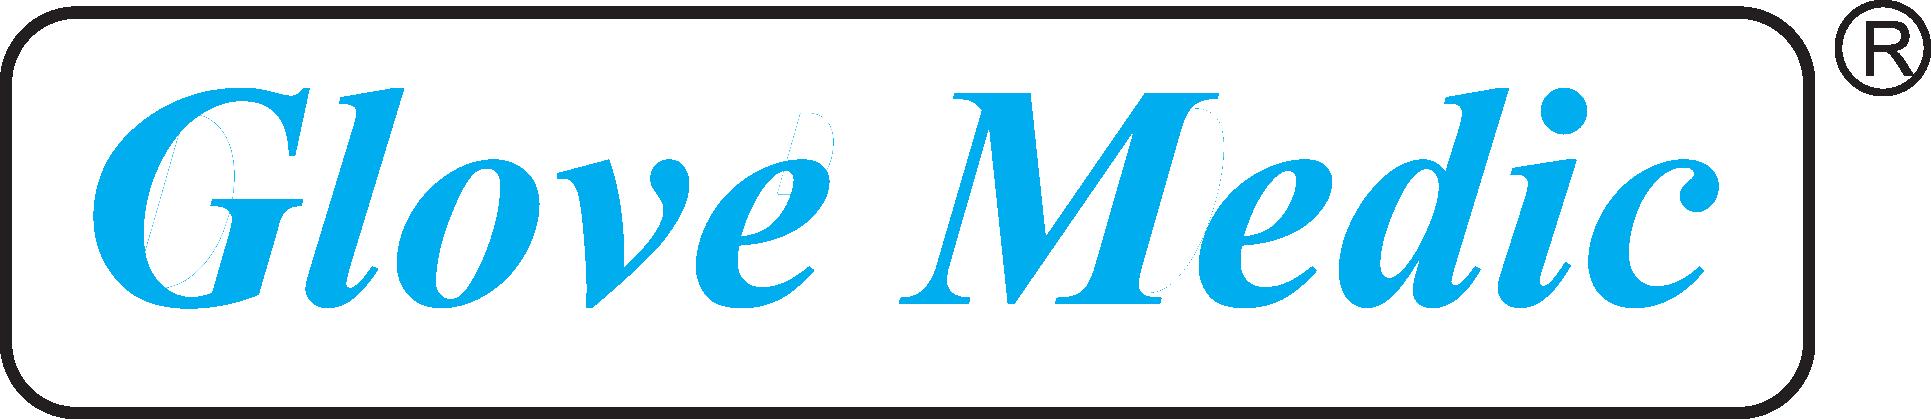 Glove Medic Label.png